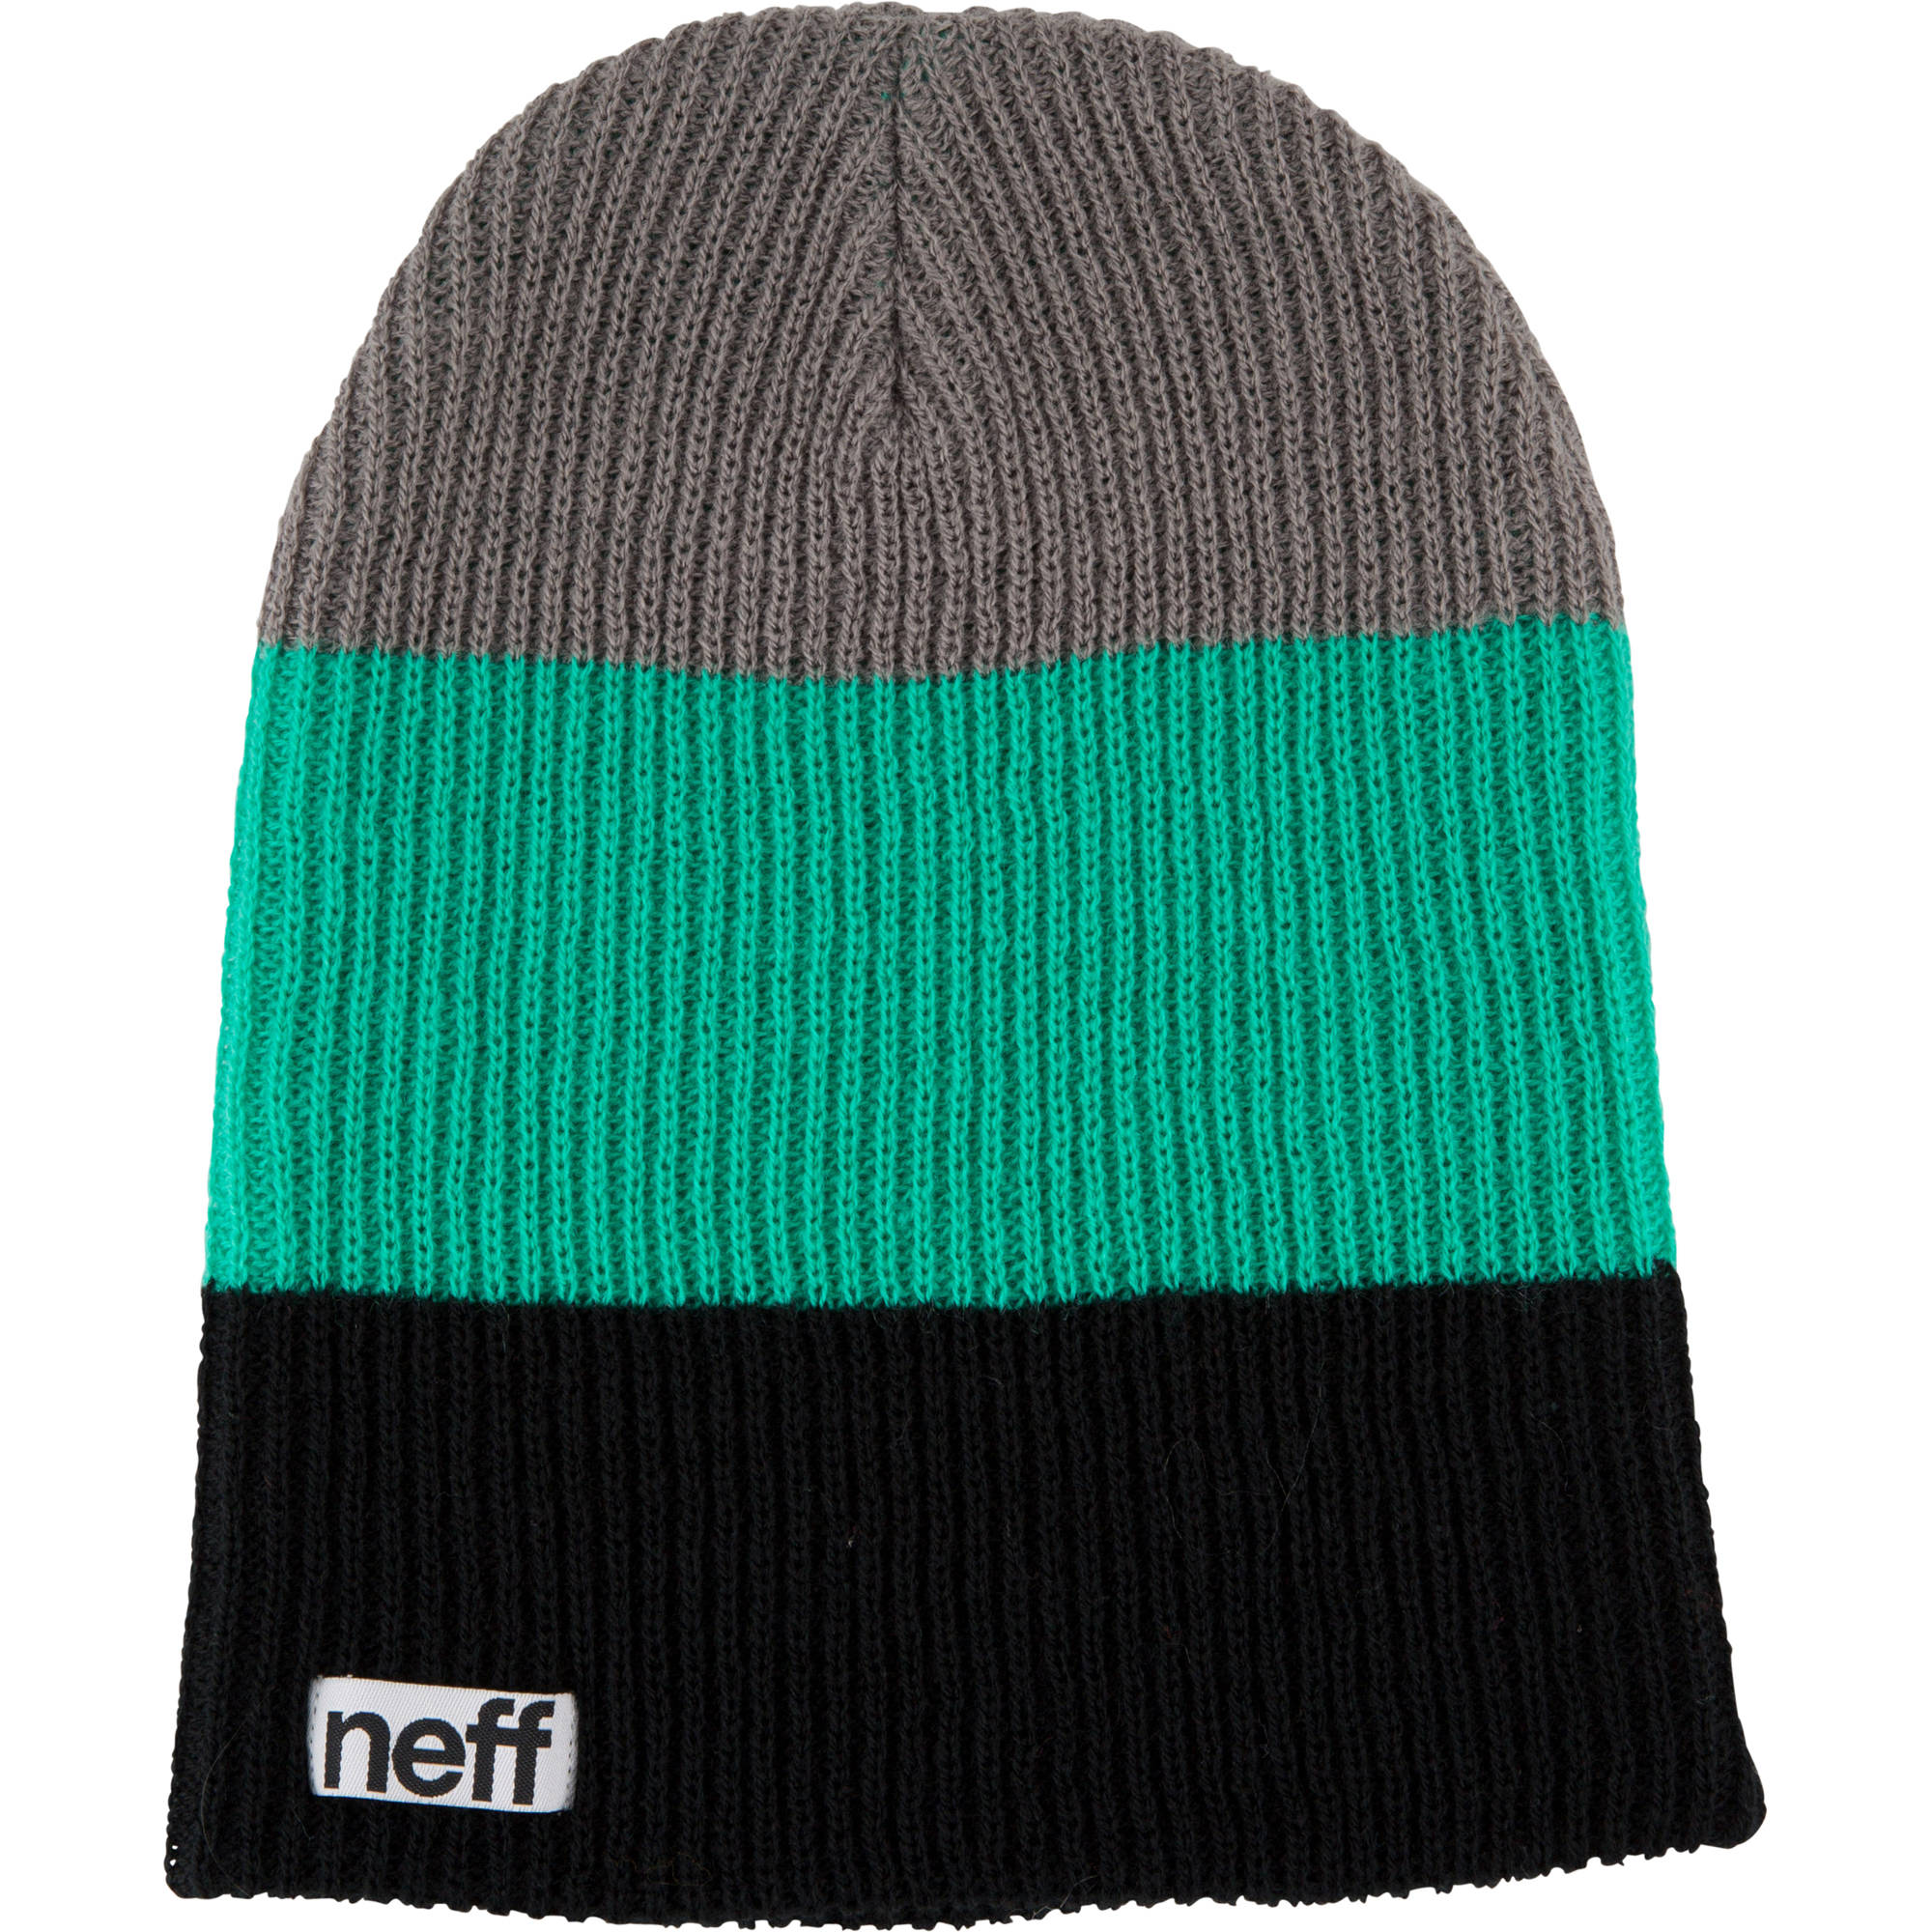 a4266ac6b7b Neff Trio Beanie (Black Green Gray) NF00005-BGNY B H Photo Video